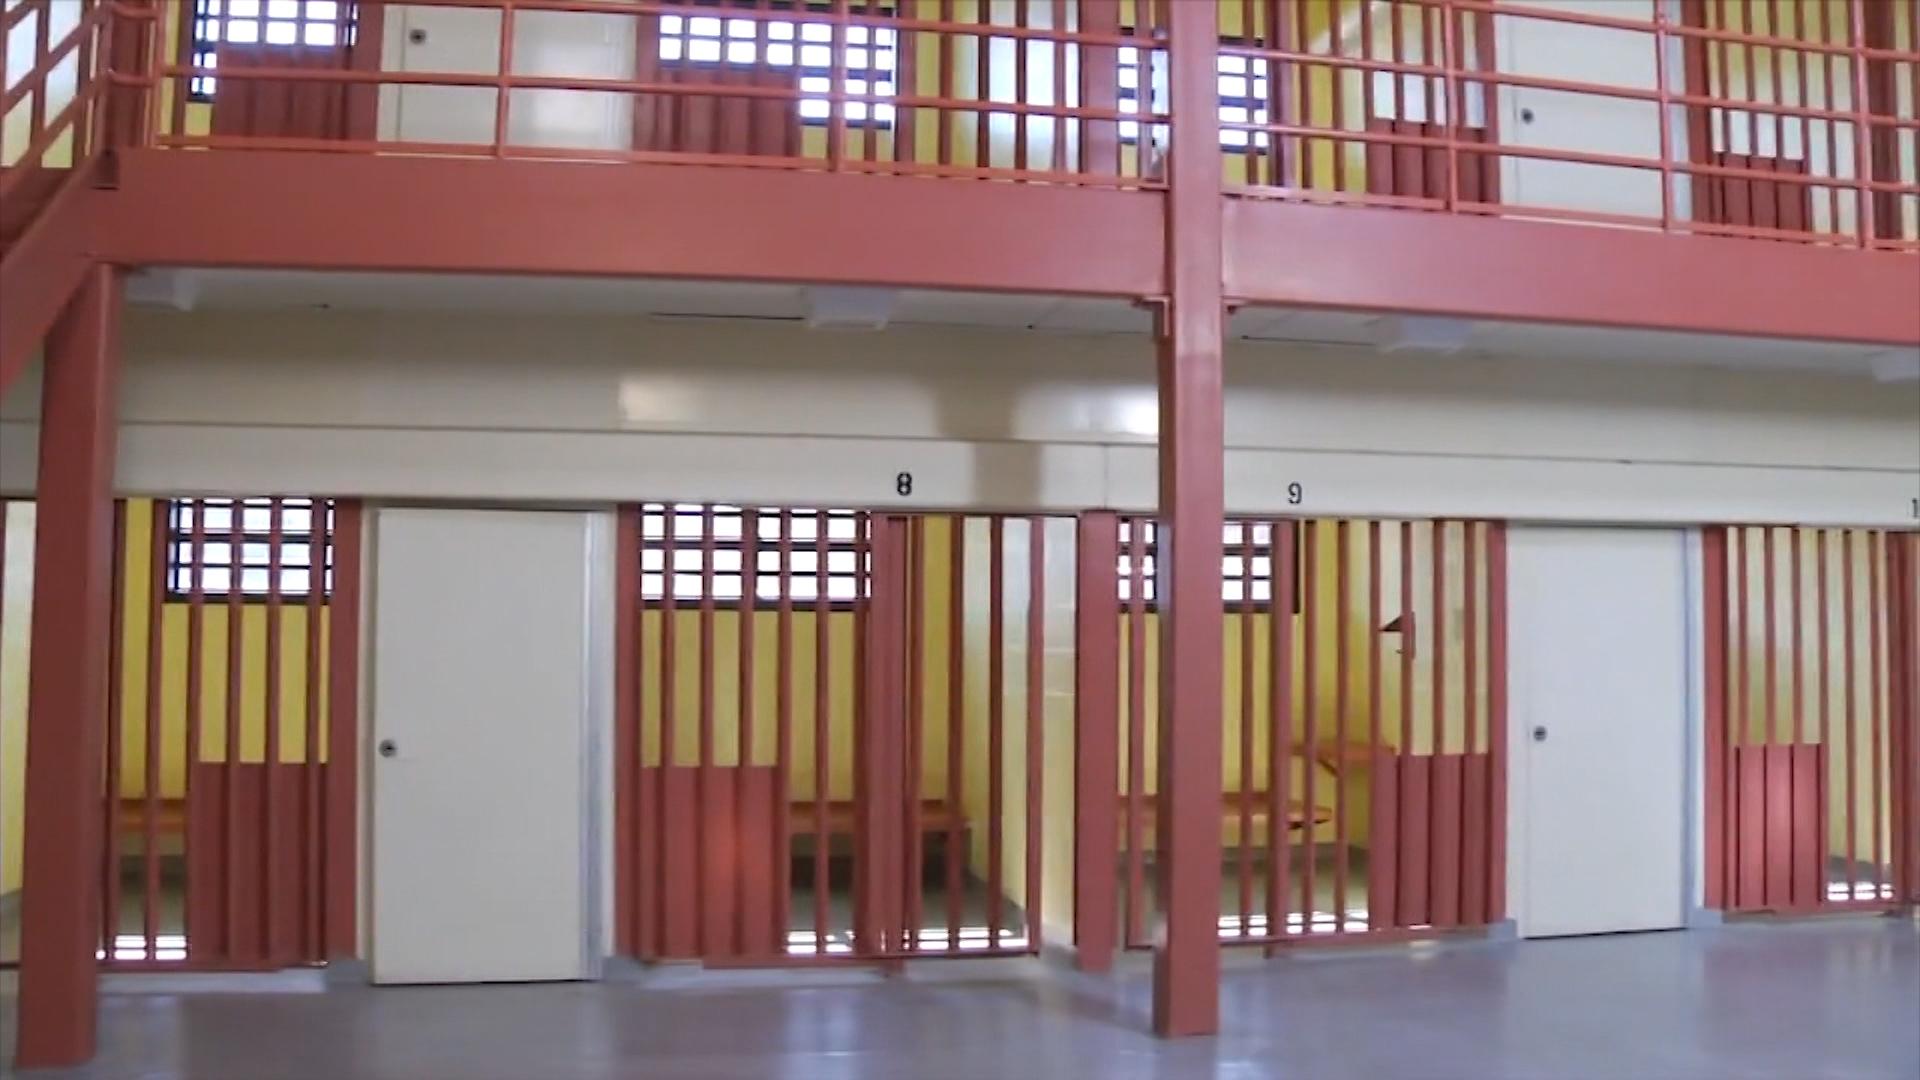 PIC Prison Healthcare_1509437753209.jpg